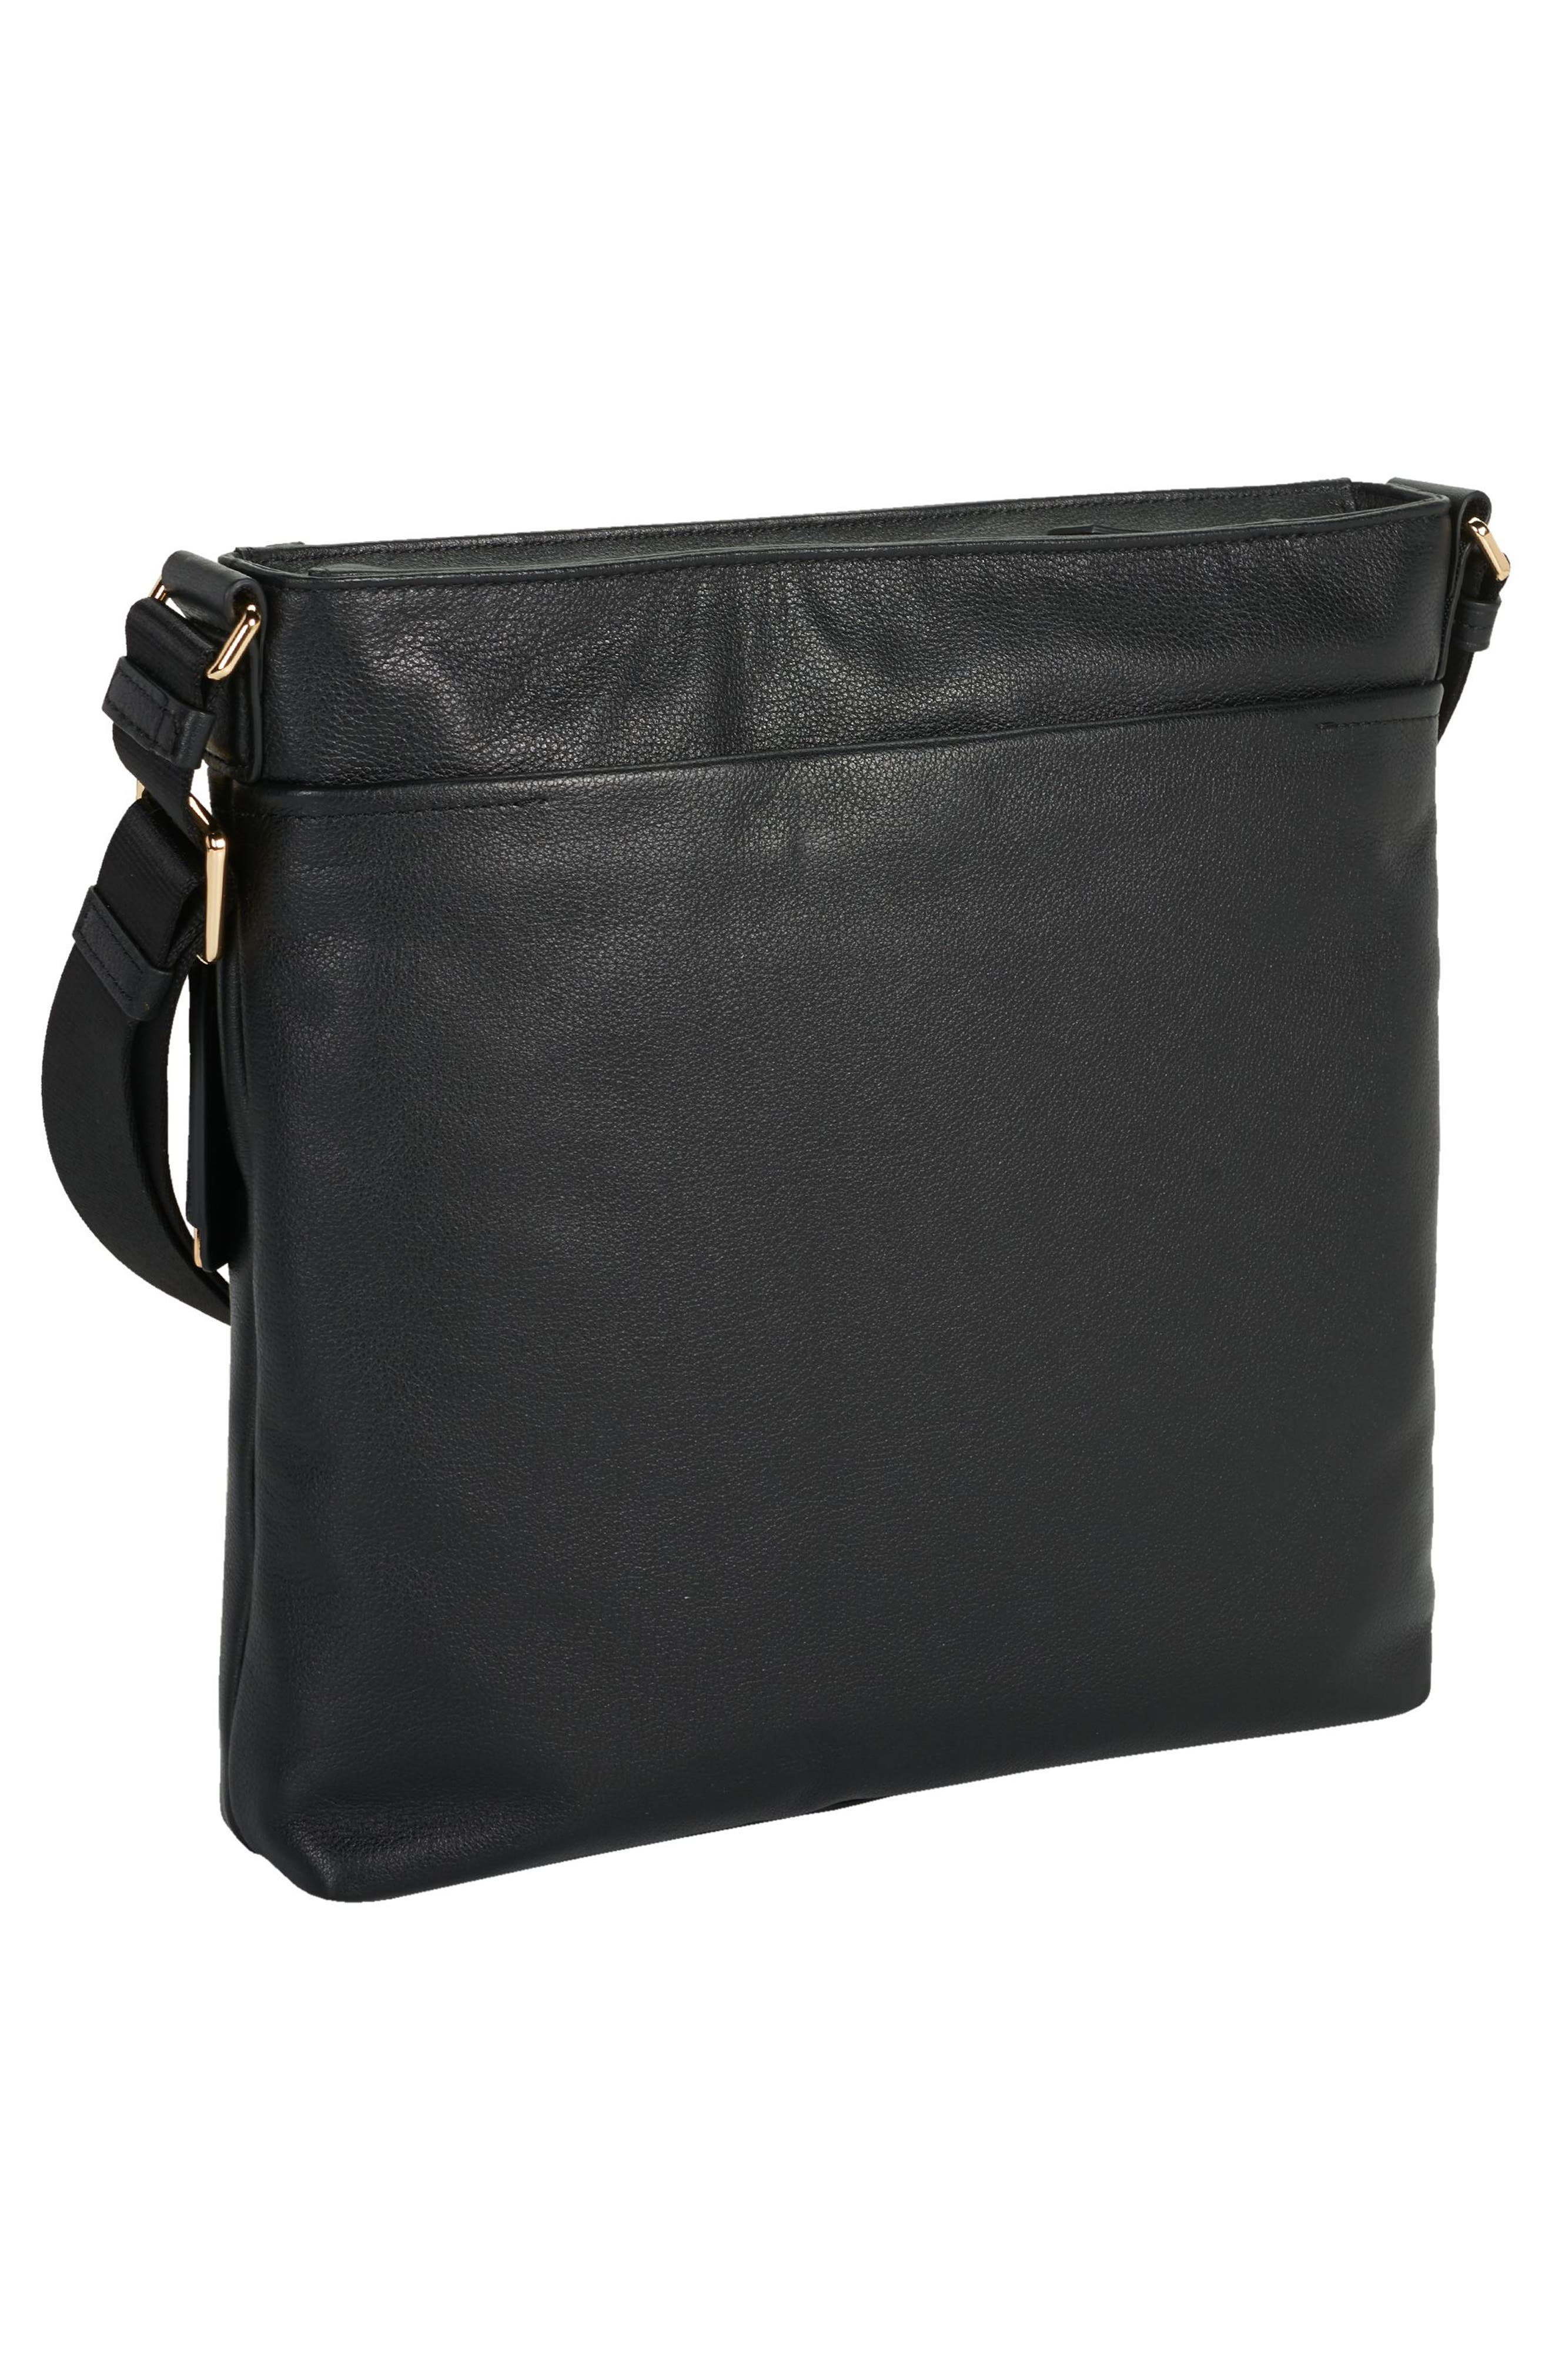 Voyageur - Capri Leather Crossbody Bag,                             Alternate thumbnail 2, color,                             Black